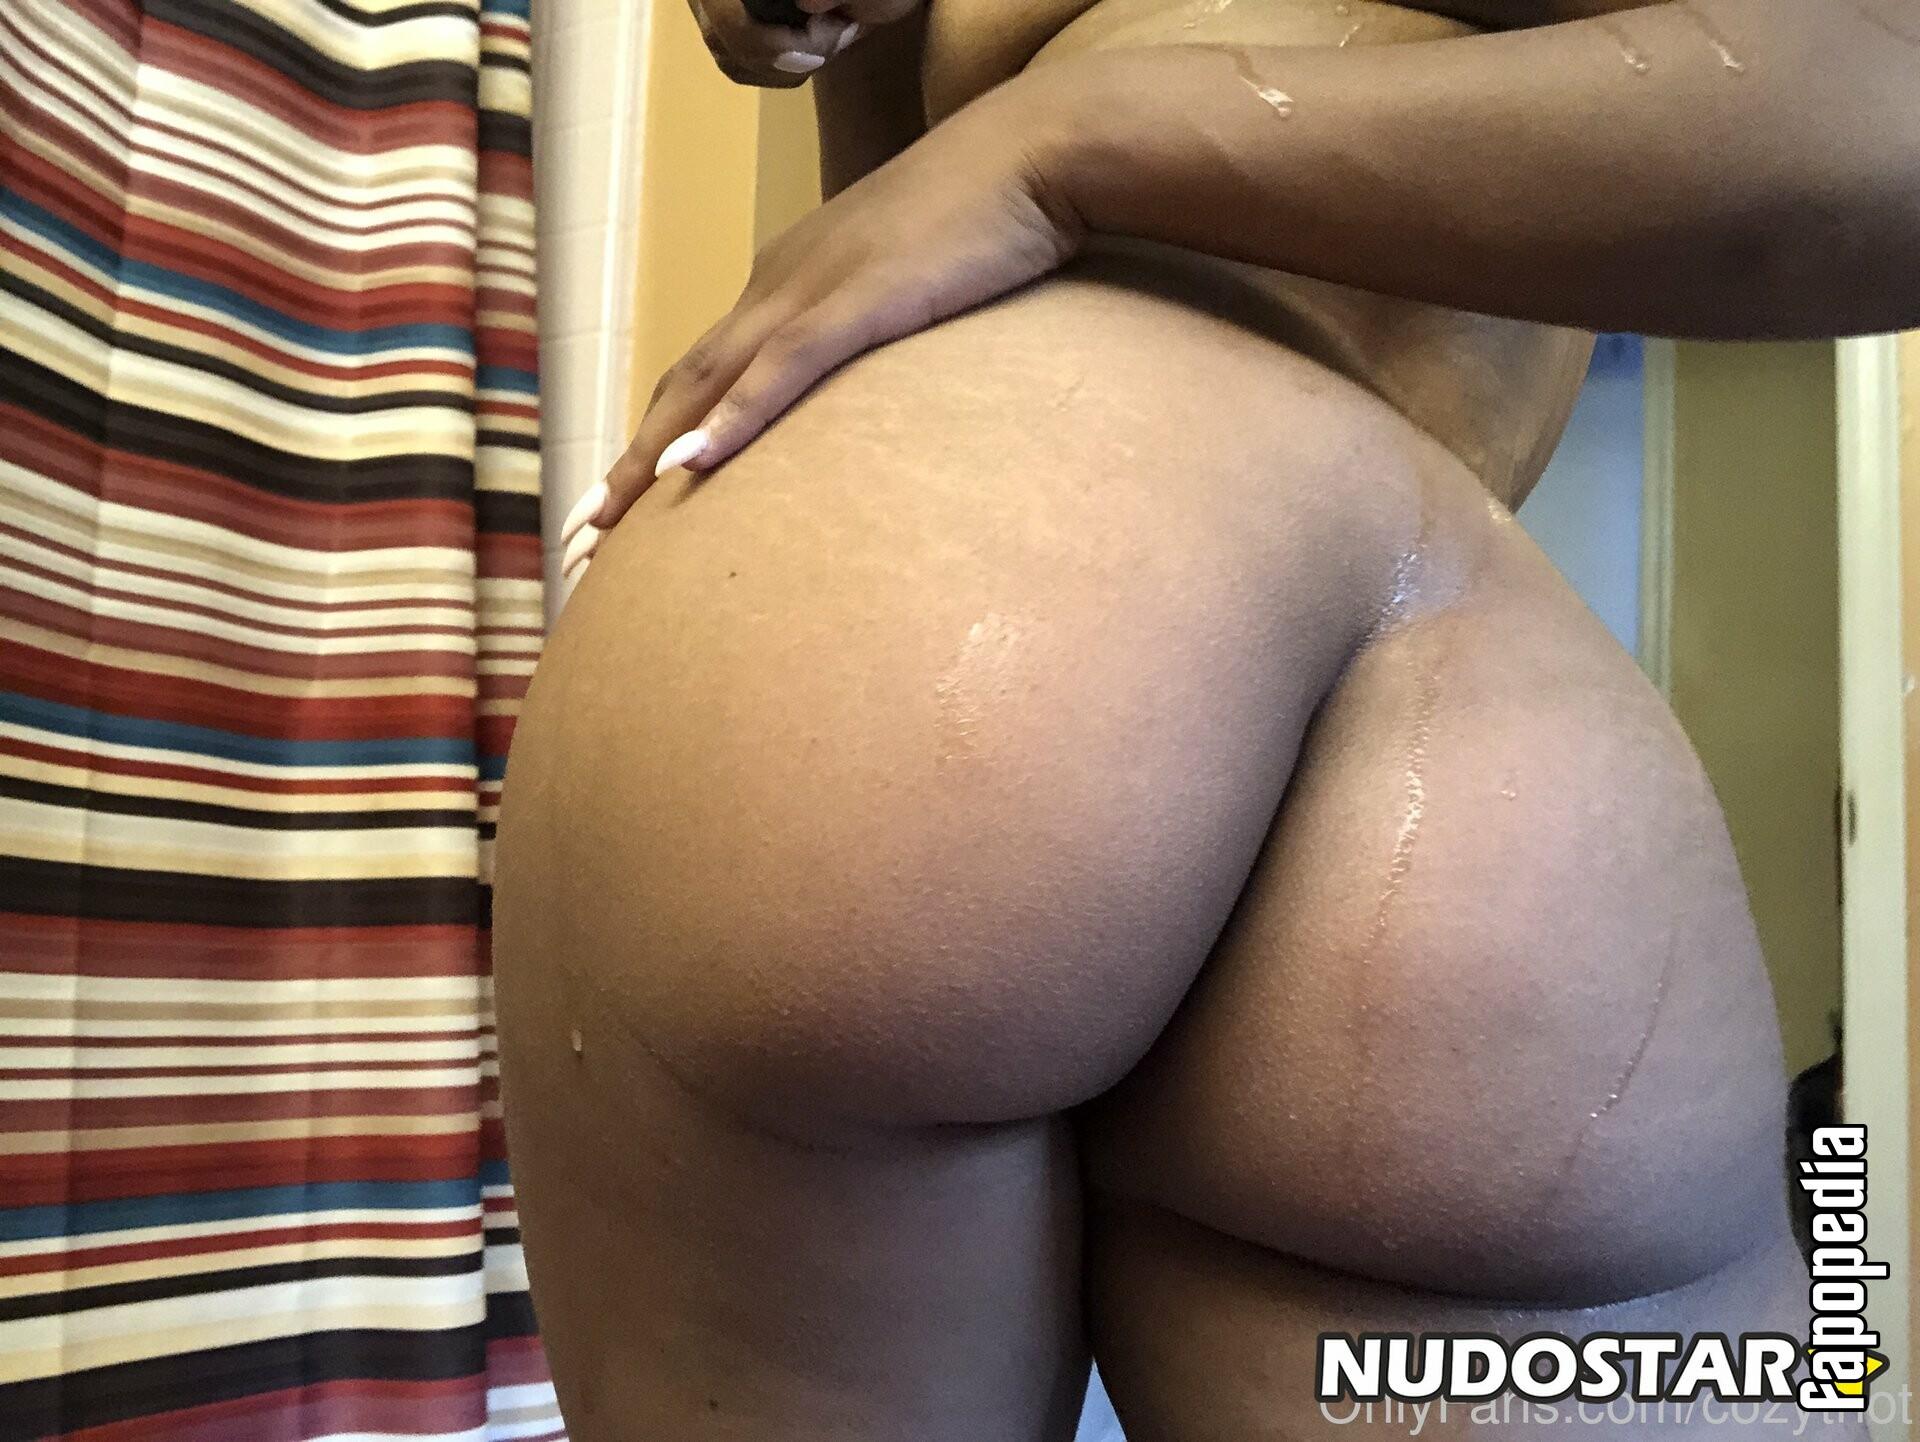 Cozythot Nude OnlyFans Leaks